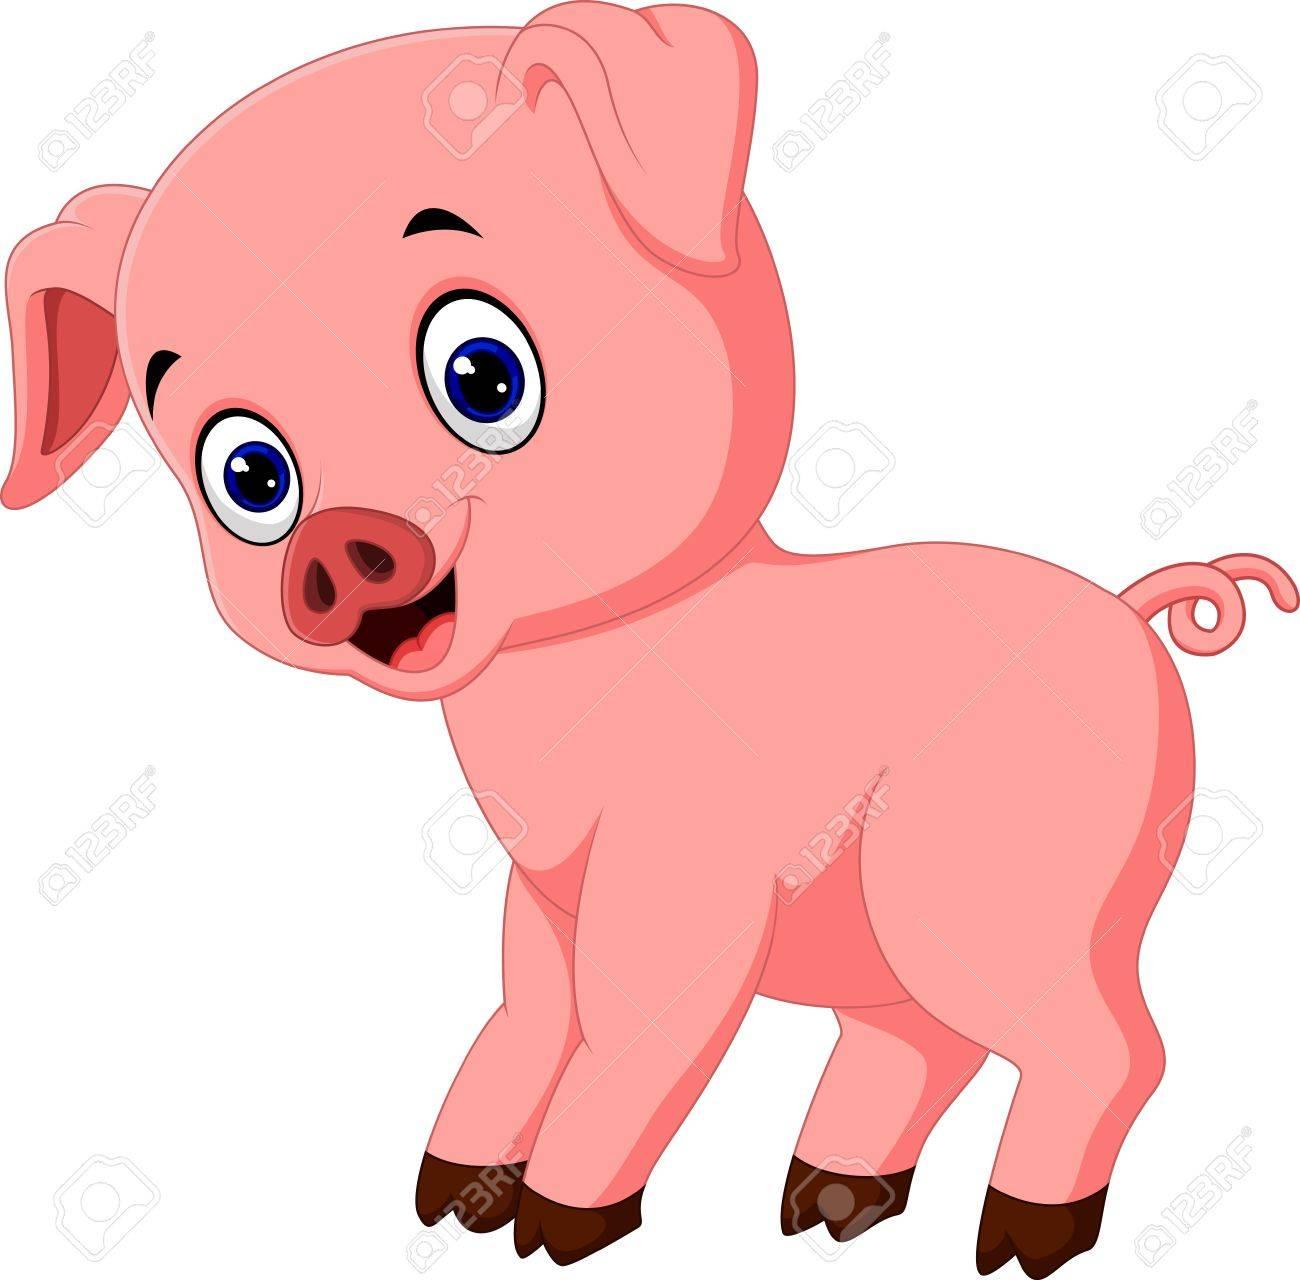 1300x1280 Cute Pig Cartoon Posing Royalty Free Cliparts, Vectors, And Stock